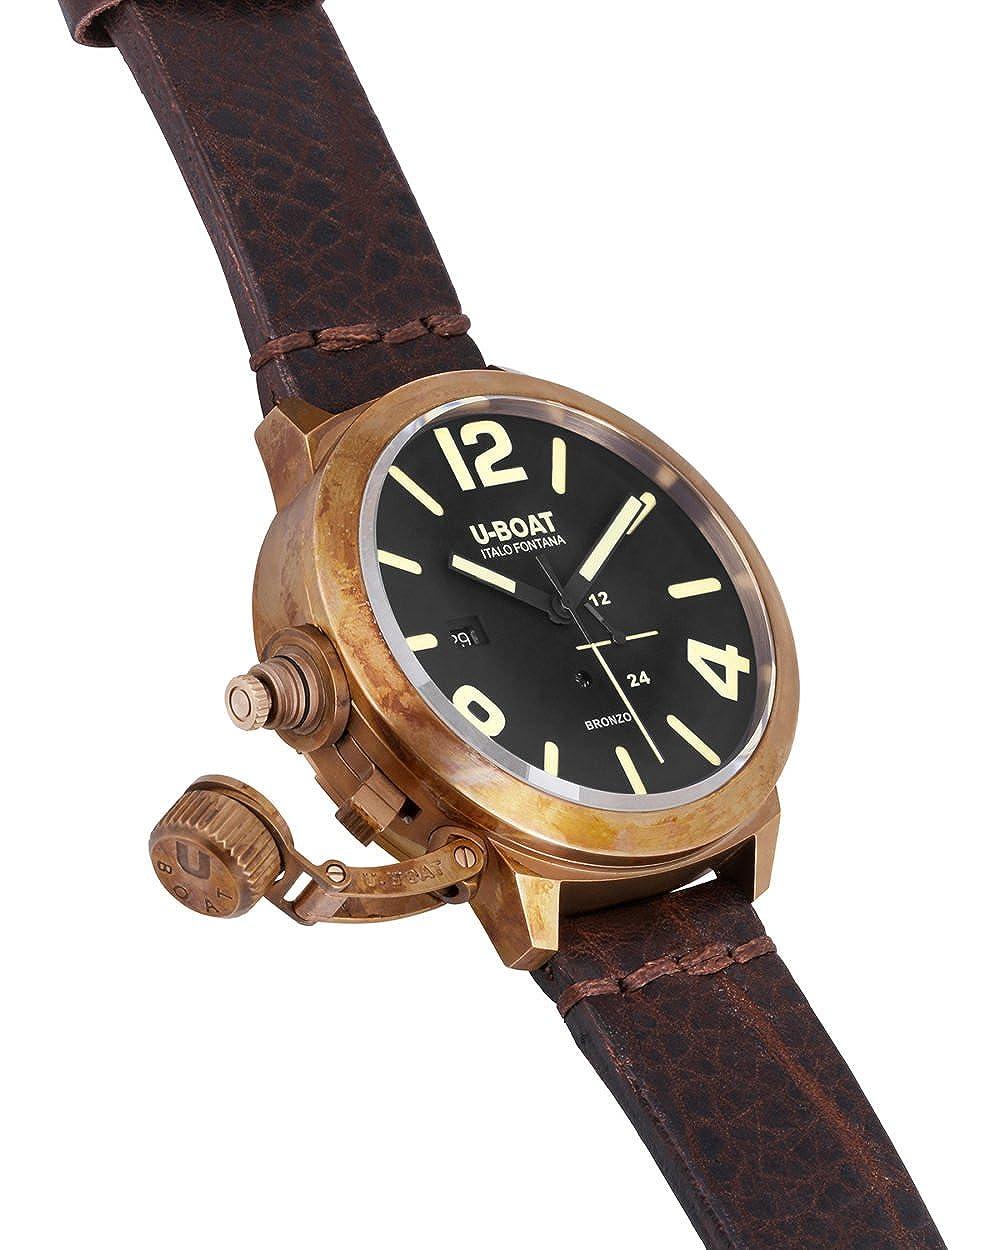 629b5a386750 Amazon.com  U-Boat 8104 Classico 50 Bronzo A BR Wristwatch  Watches